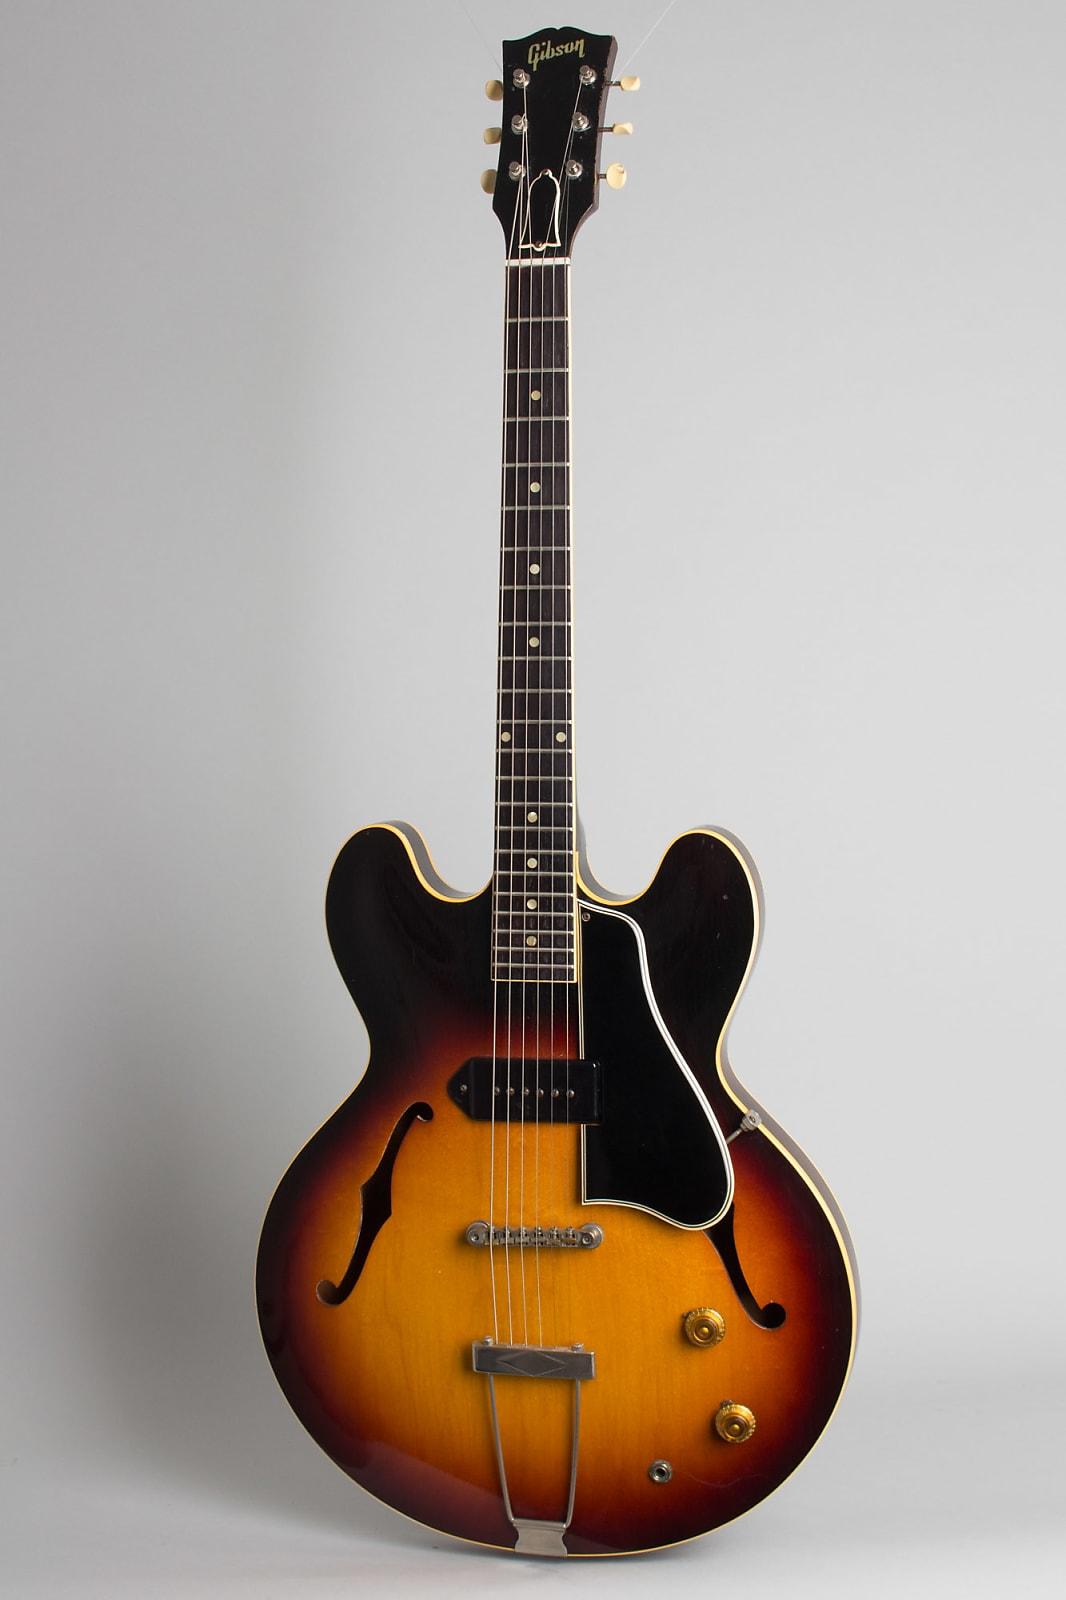 Gibson  ES-330T Thinline Hollow Body Electric Guitar (1960), ser. #R4289-20, black tolex hard shell case.